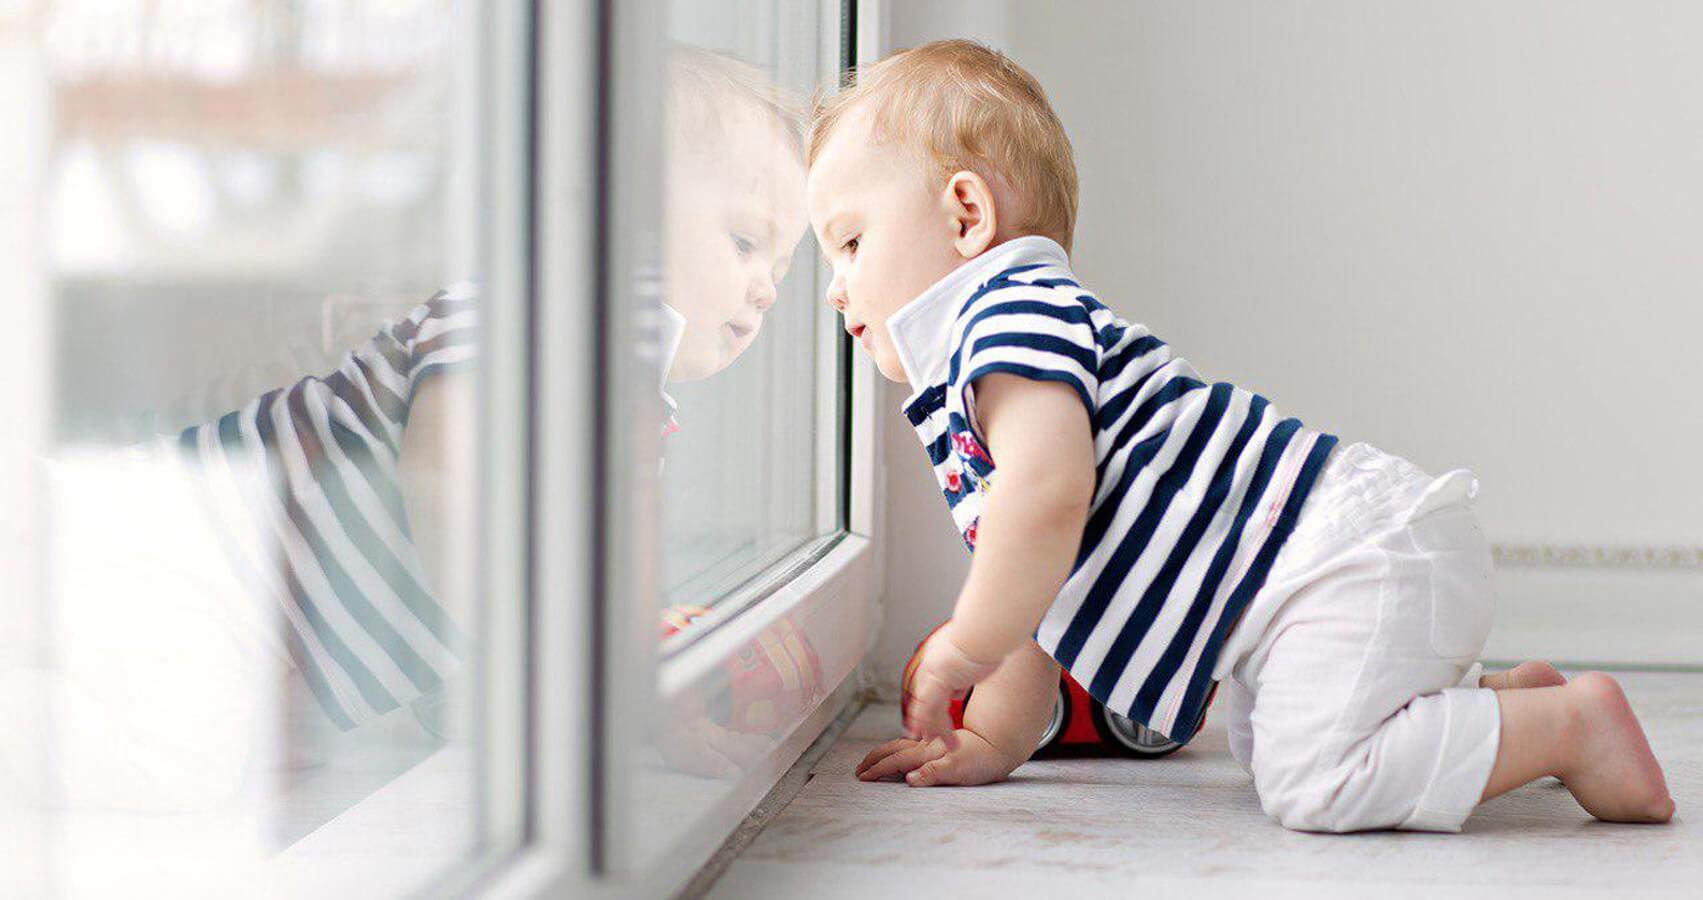 Рекомендации по защите детей от падения из окон